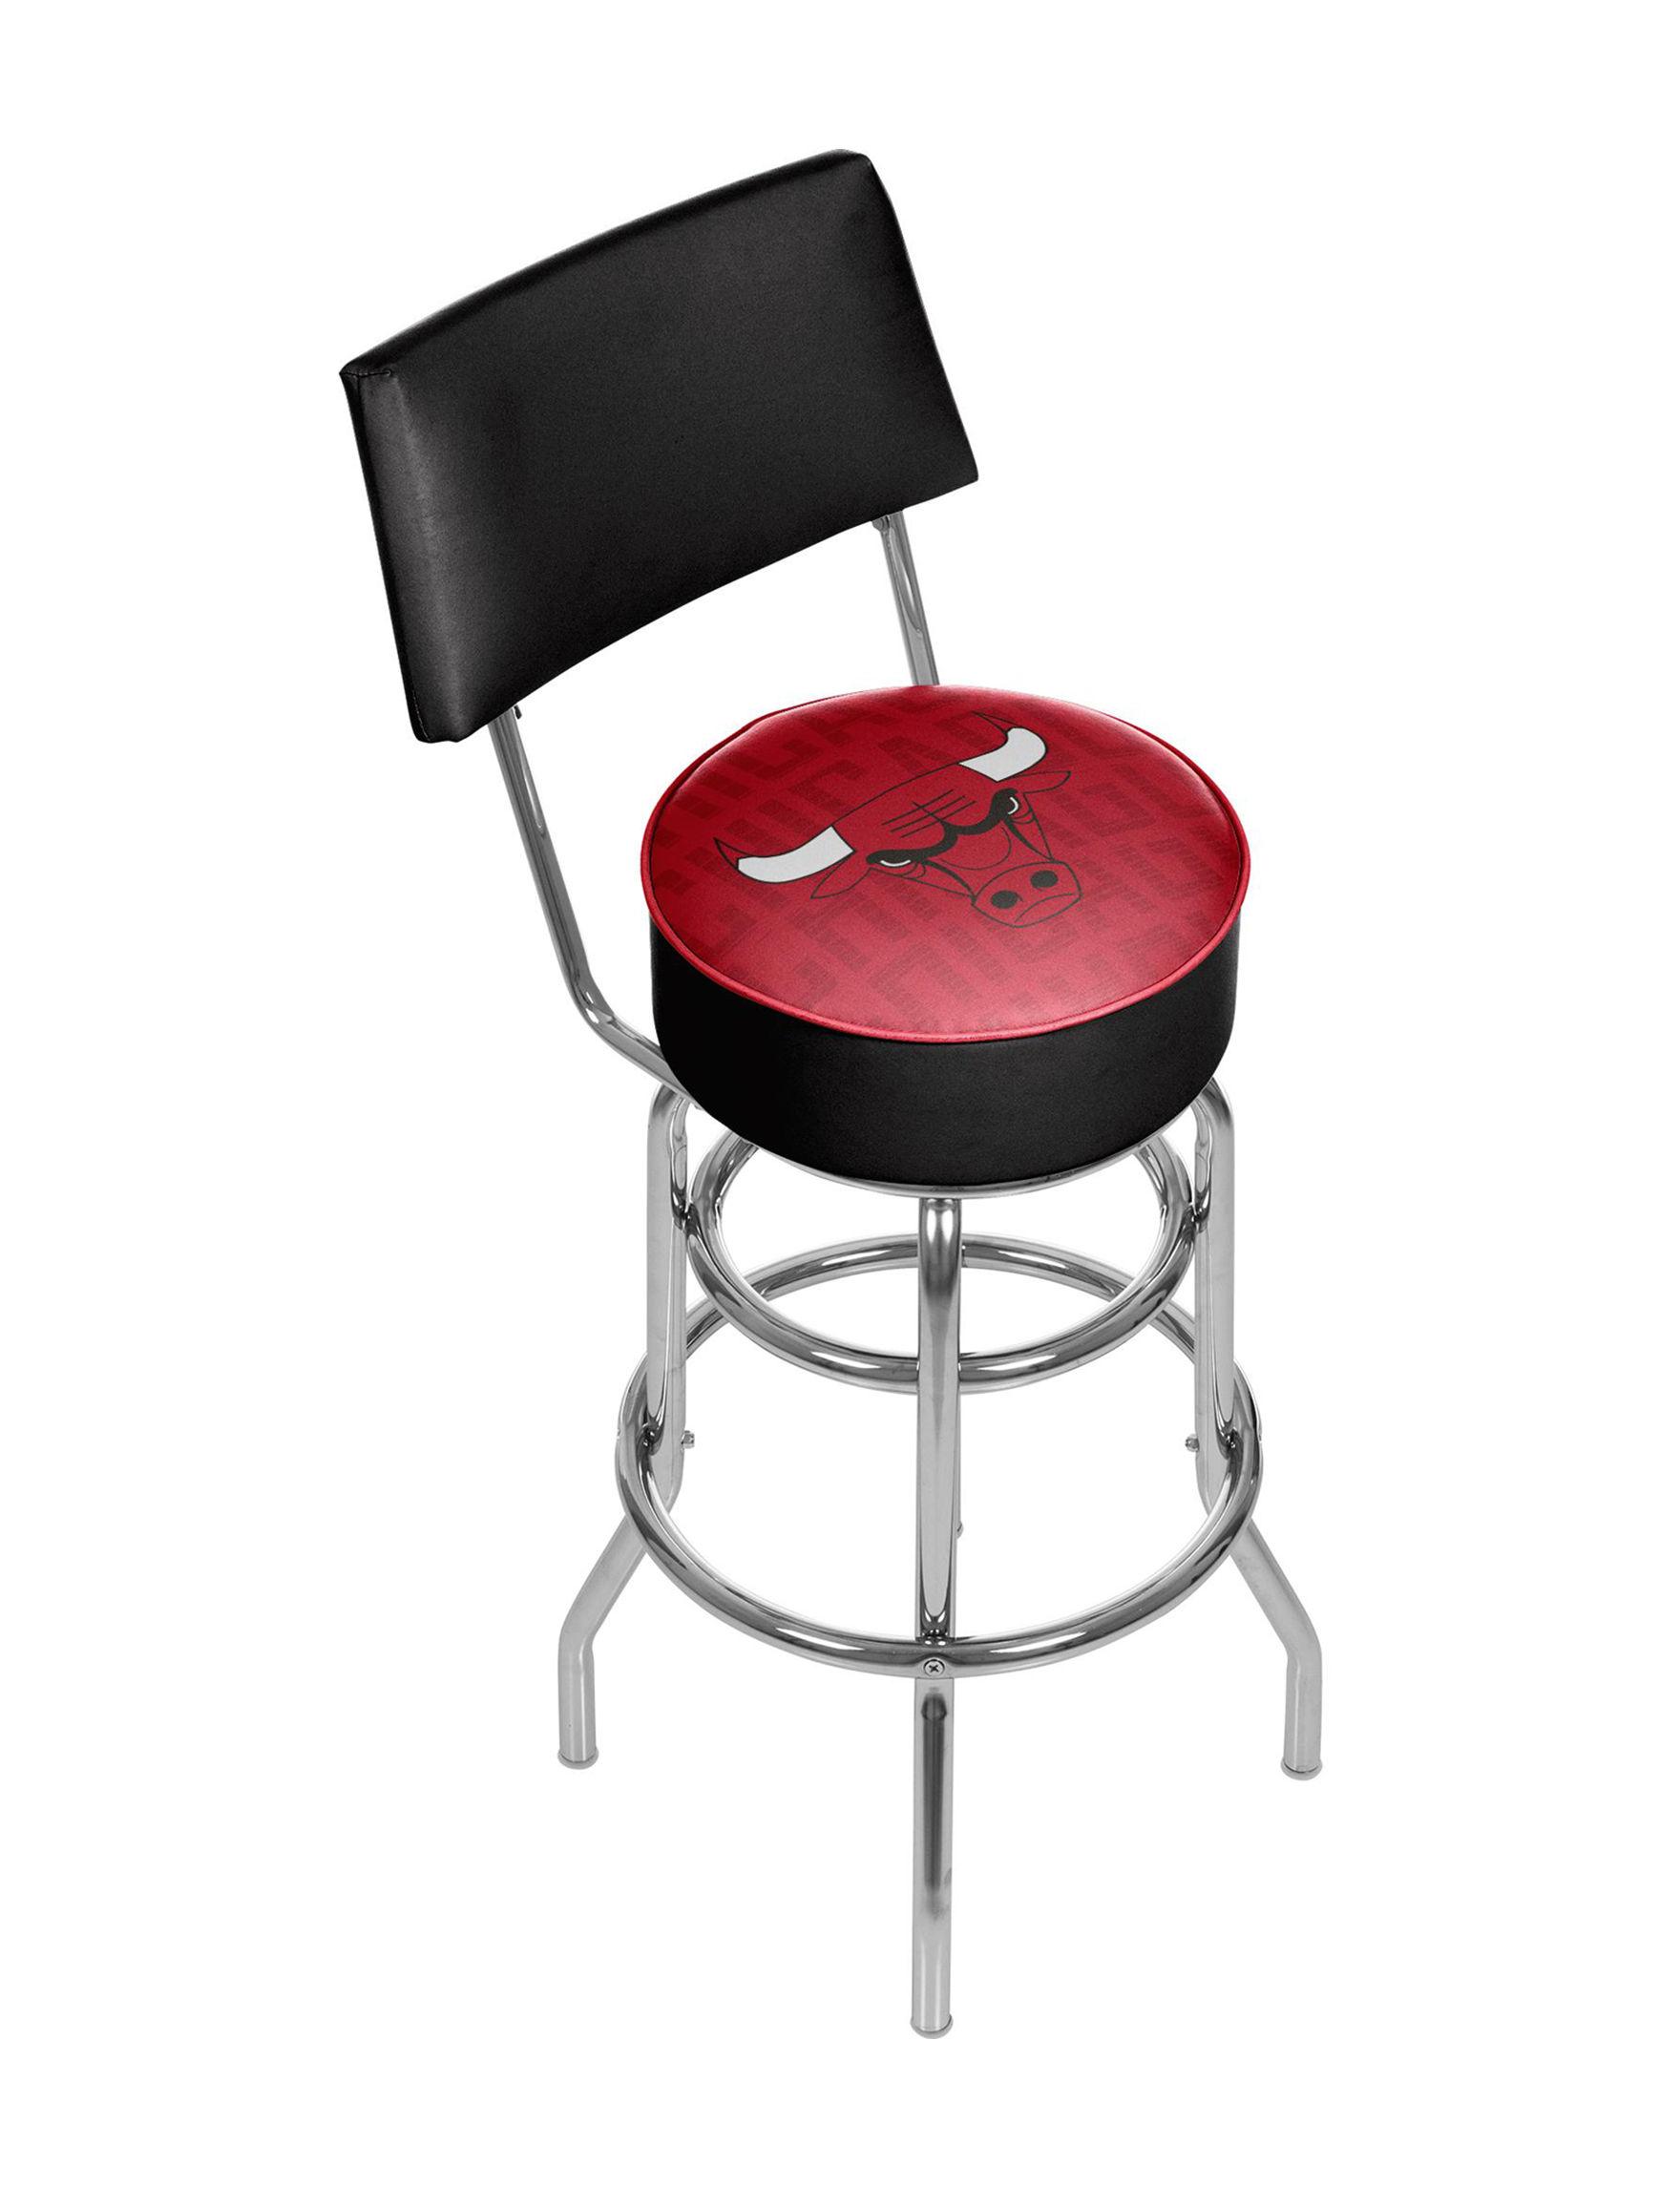 Trademark Global Red / Black / White Bar & Kitchen Stools Kitchen & Dining Furniture